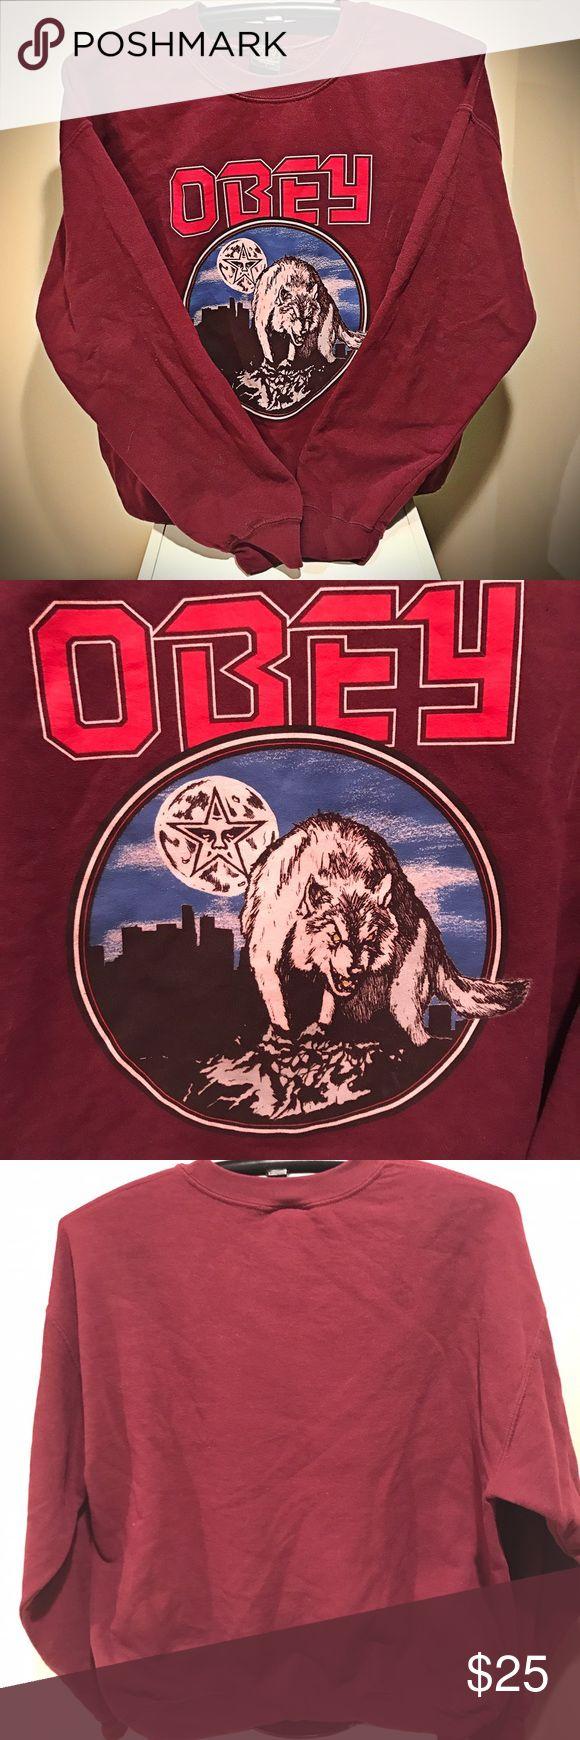 OBEY Burgundy Wolf Crewneck Sweatshirt Badass wolf print ladies crewneck by OBEY! Never worn! Excellent condition! No Trades! Obey Tops Sweatshirts & Hoodies